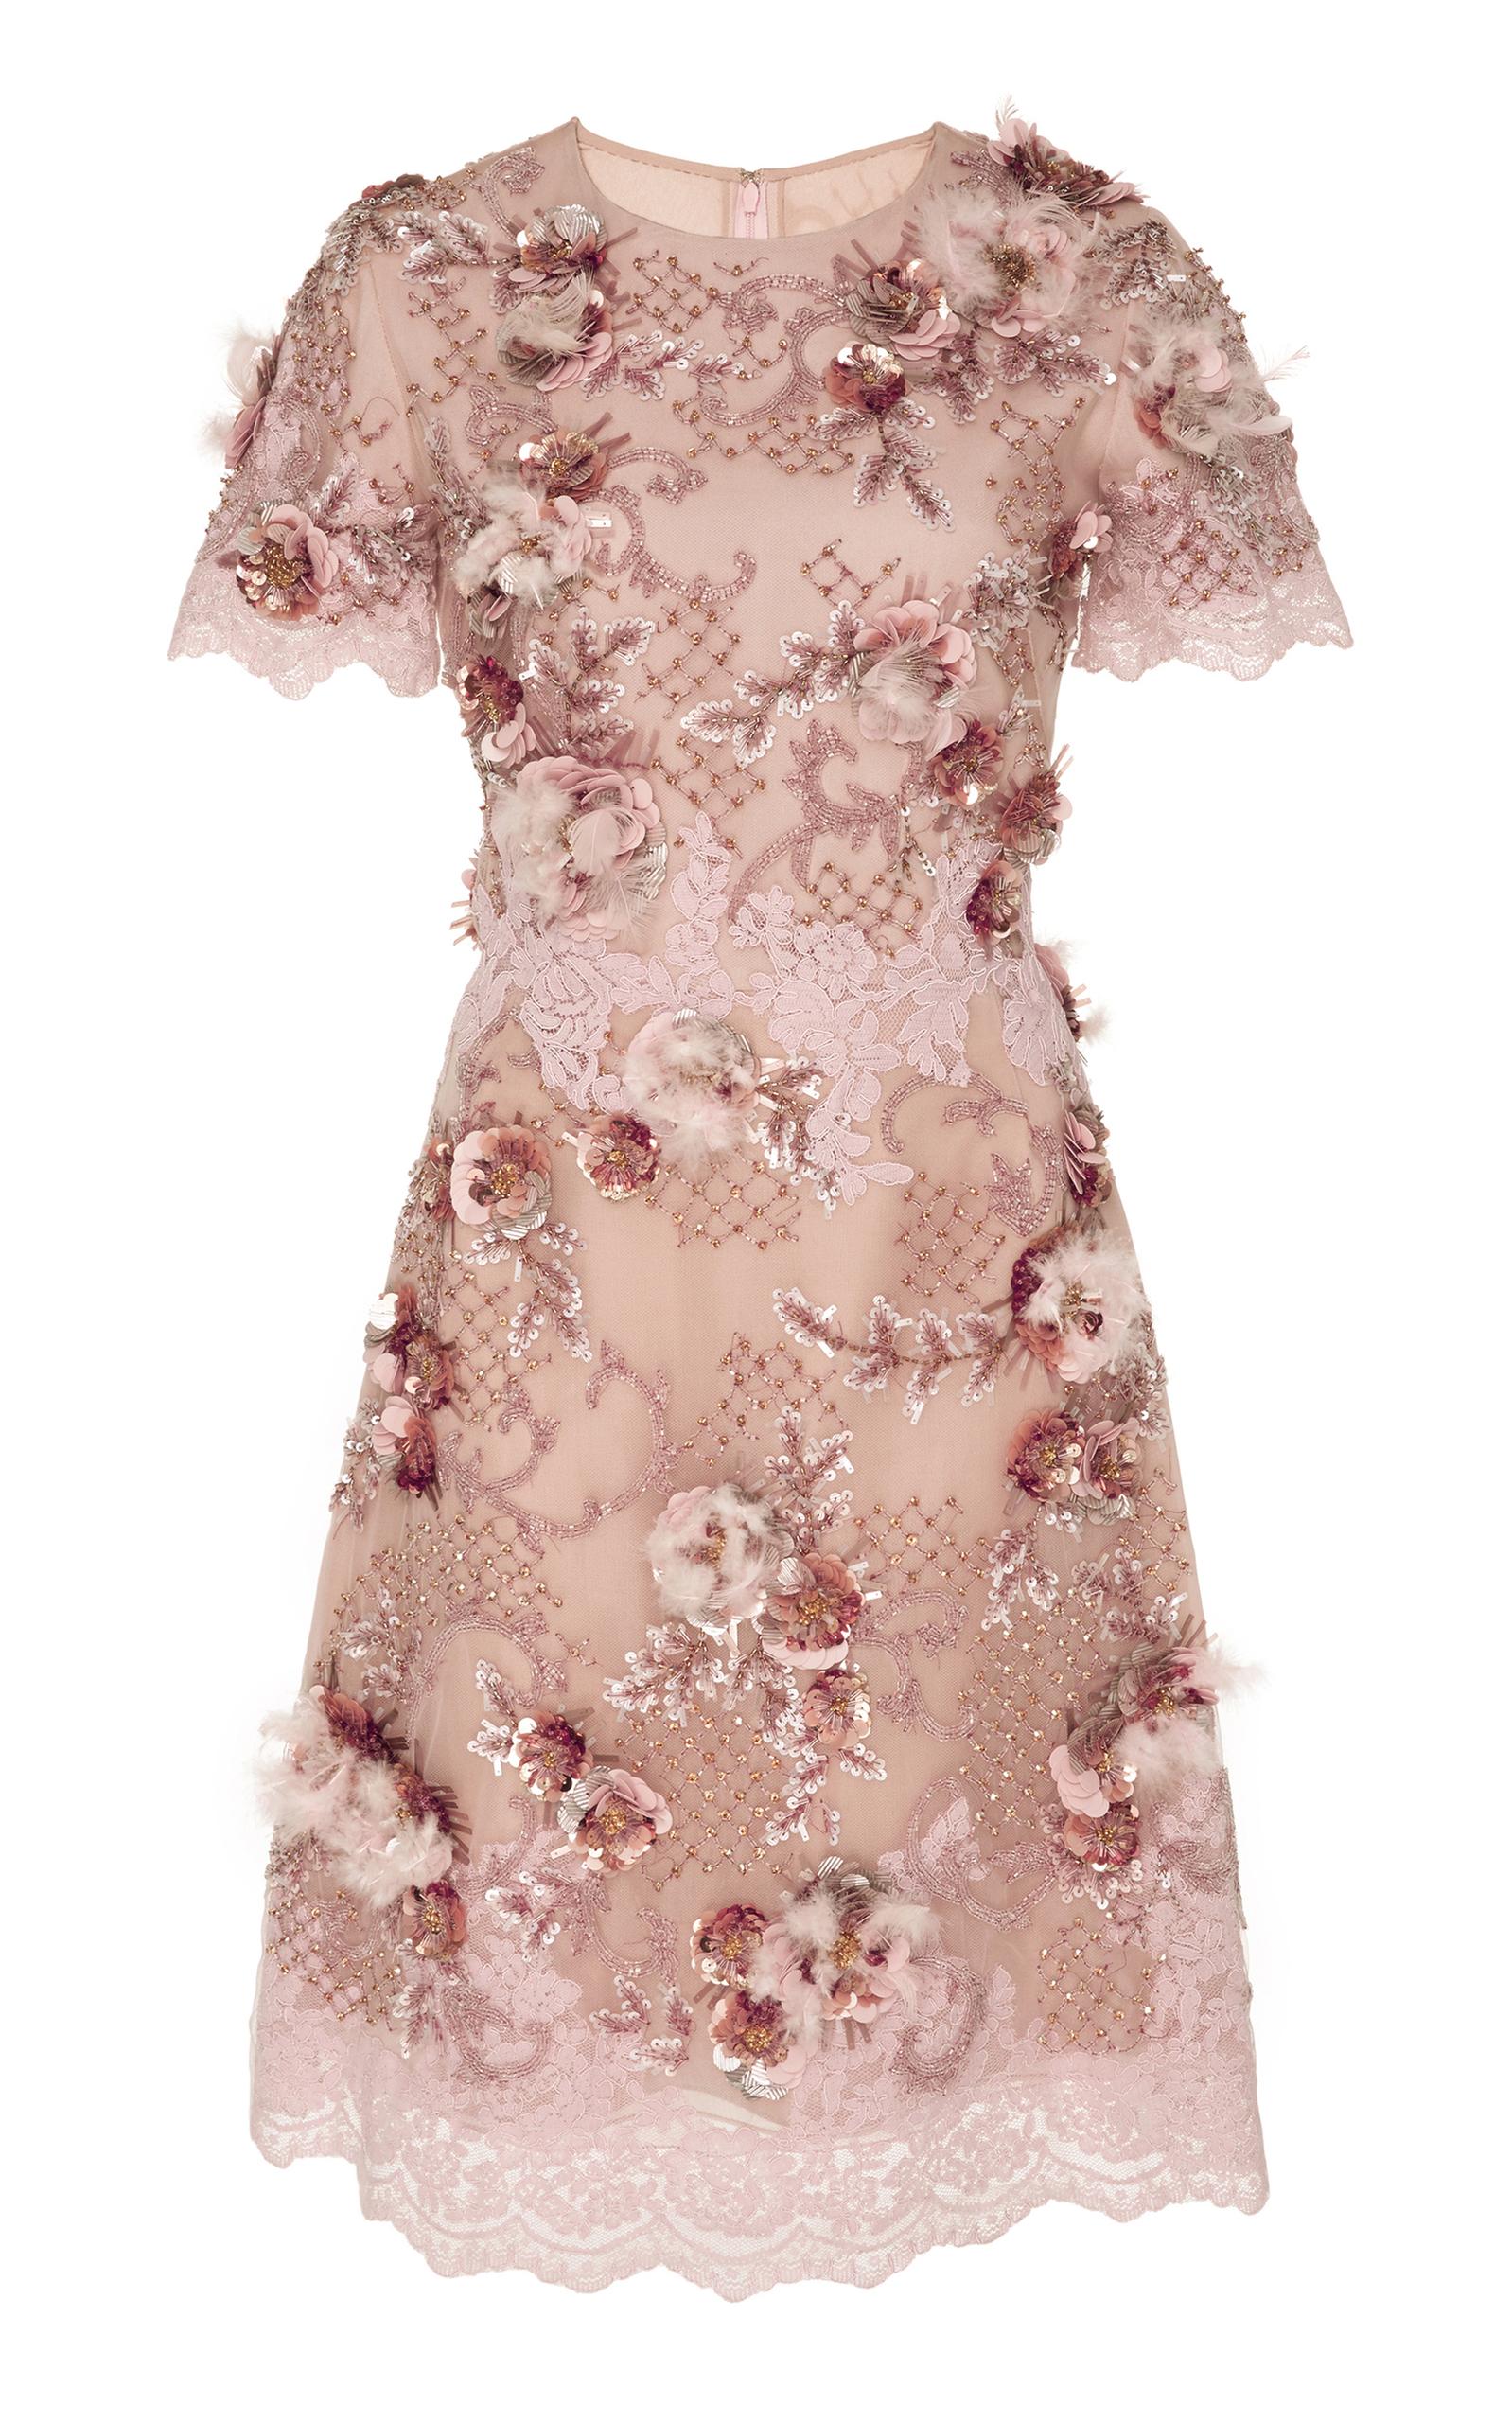 Floral Embellished Cocktail Dress by Marchesa | Moda Operandi